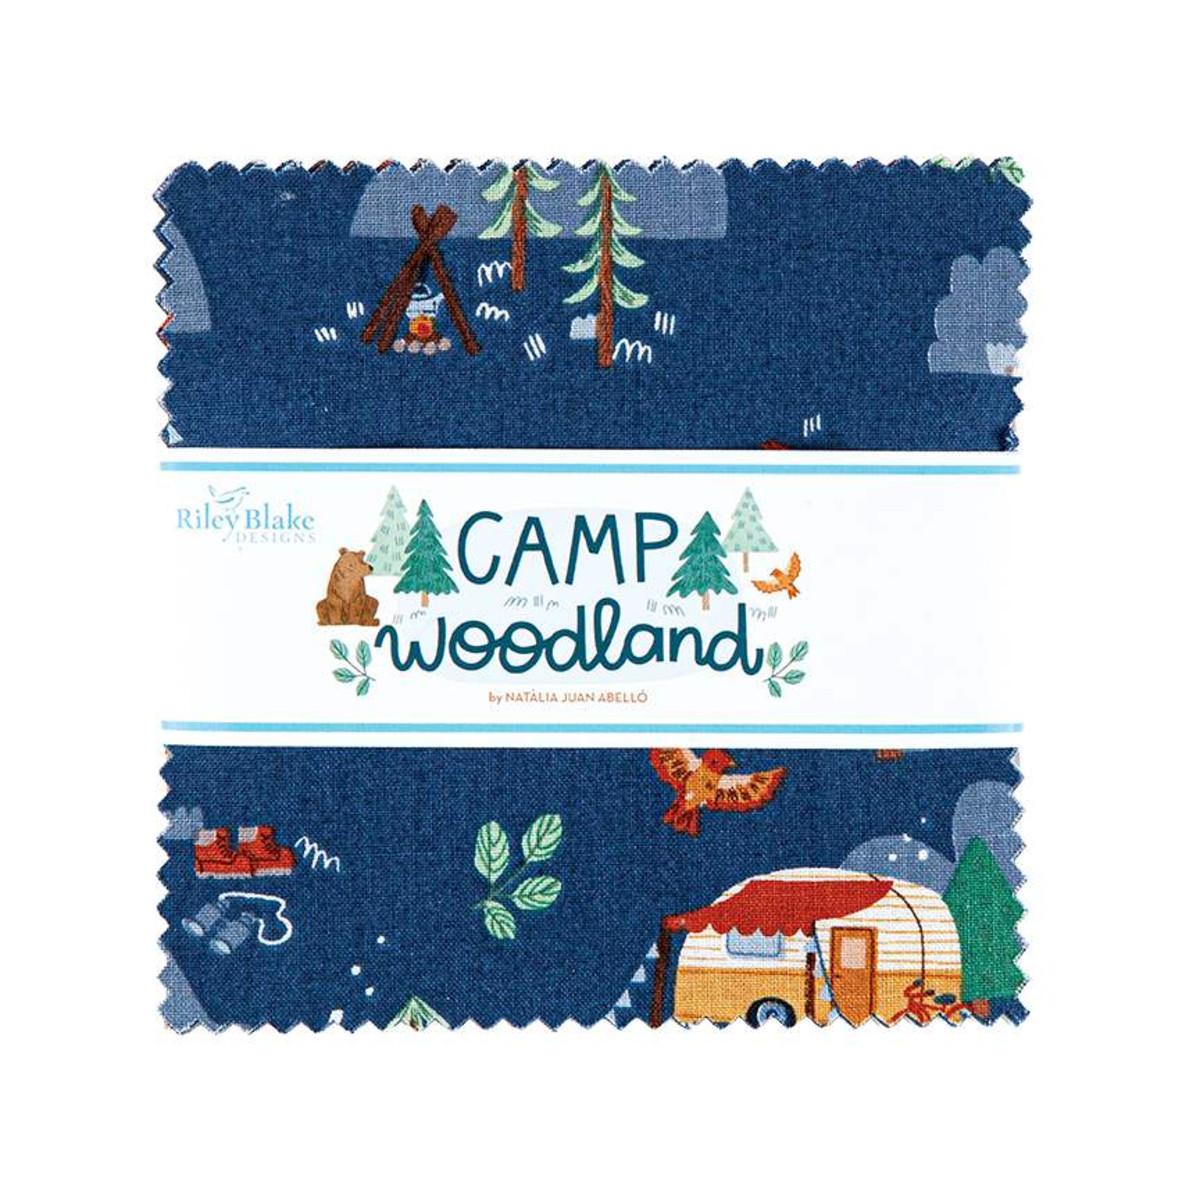 Riley Blake Charm Pack - Camp Woodland by Natàlia Juan Abelló